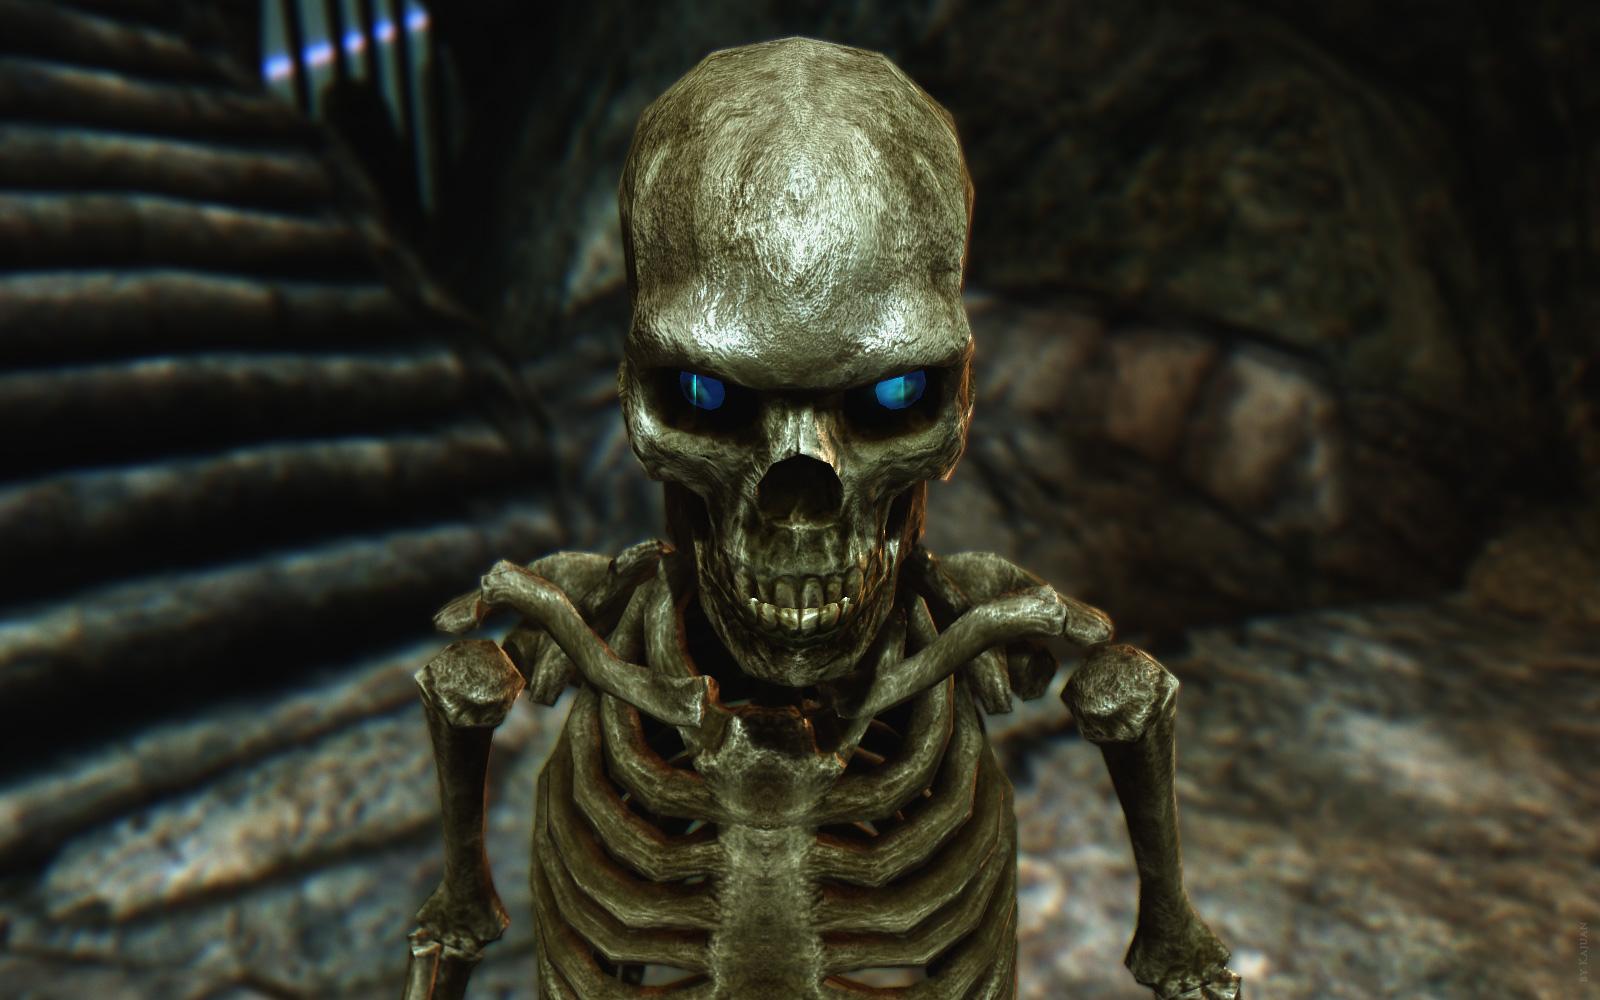 Macromedia Projector Skeleton Inc - Free